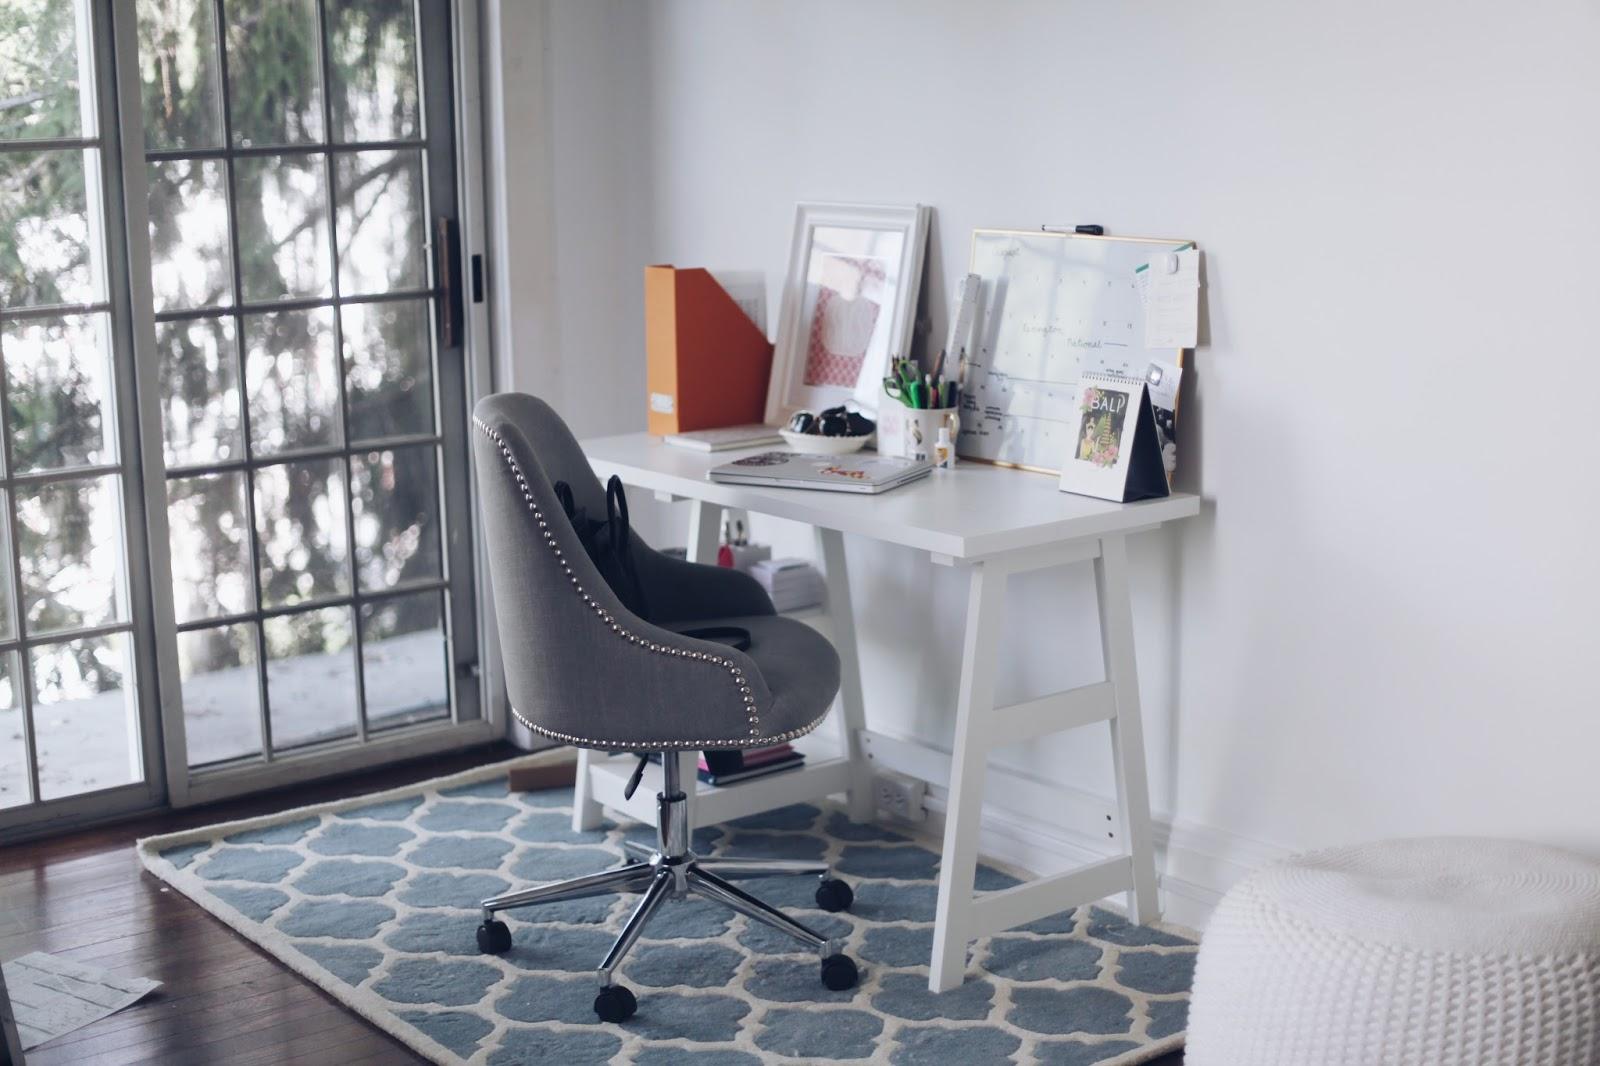 Awesome Desk Chair Joss u Main Desk Casa Moroccan Rug Safavieh via Wayfair White Board Calendar Target Couch PBTeen Faux Fur Rug